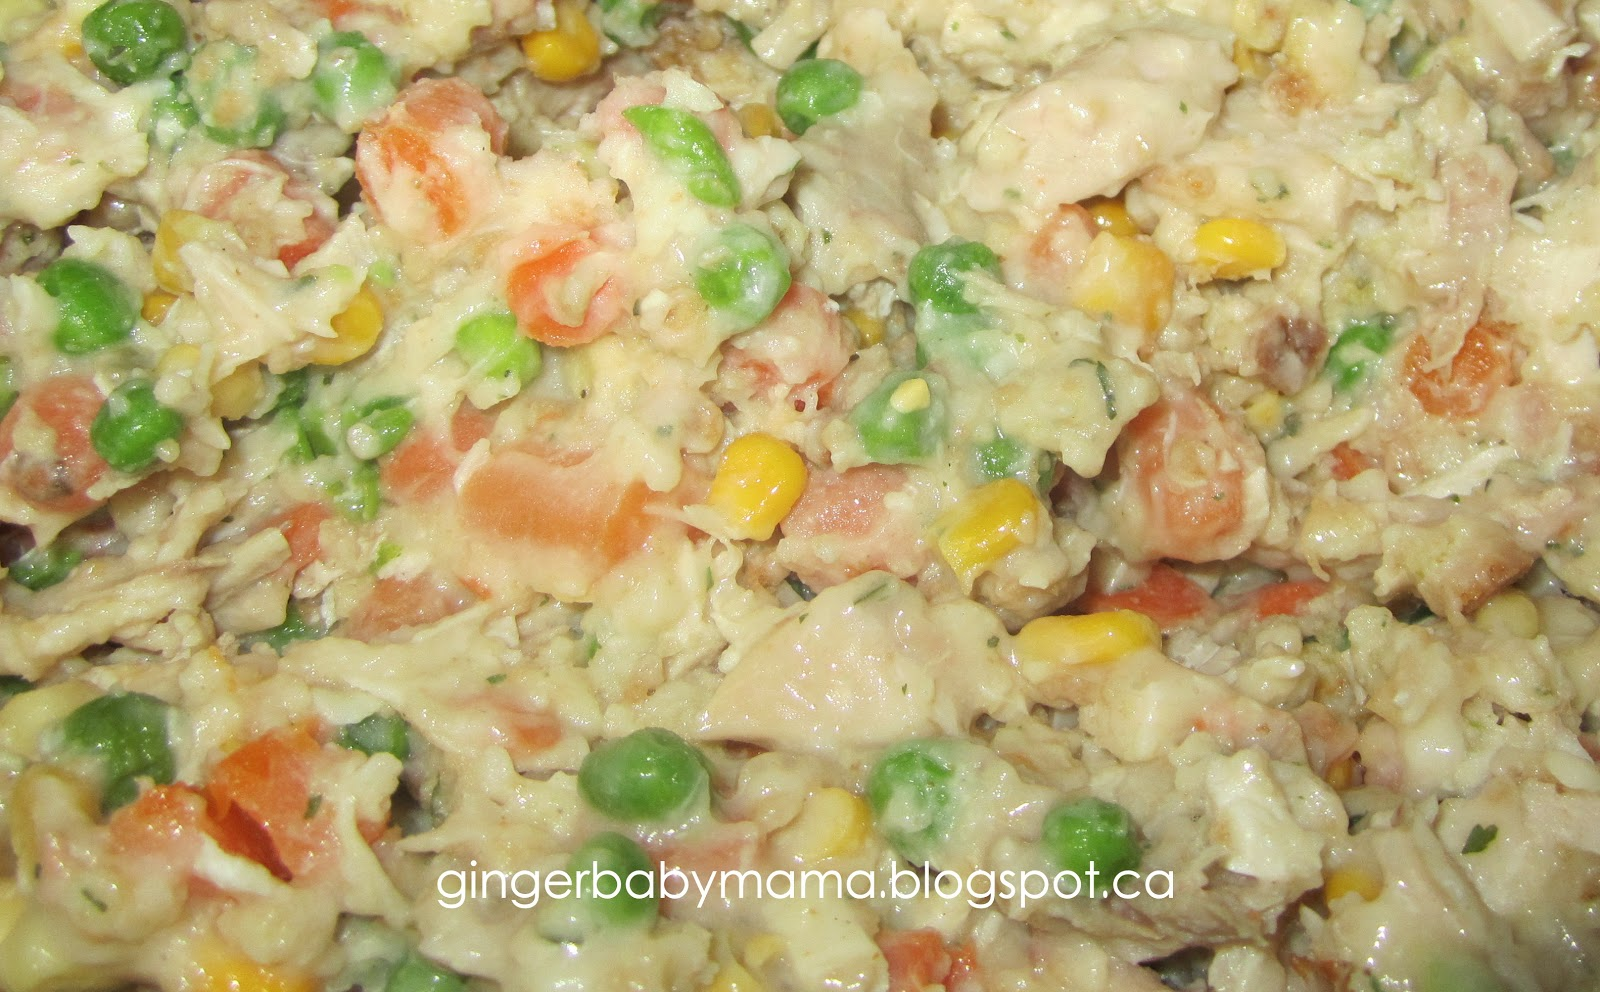 GingerBabyMama: Leftover Chicken Pot Pie Recipe (and Freezer Meal!)